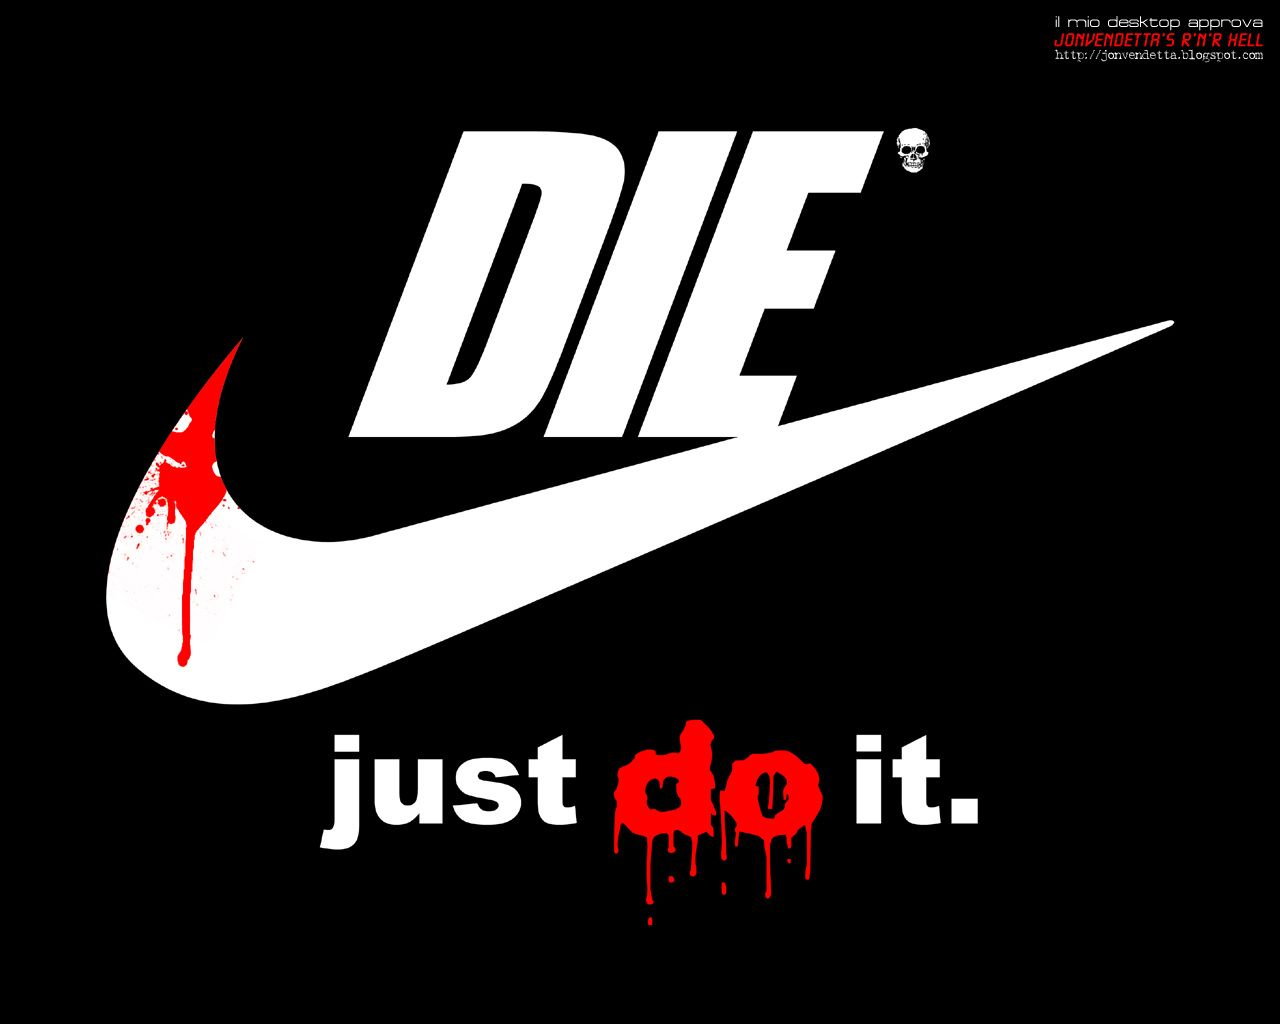 DIE just do it | Funny | Pinterest | Humor